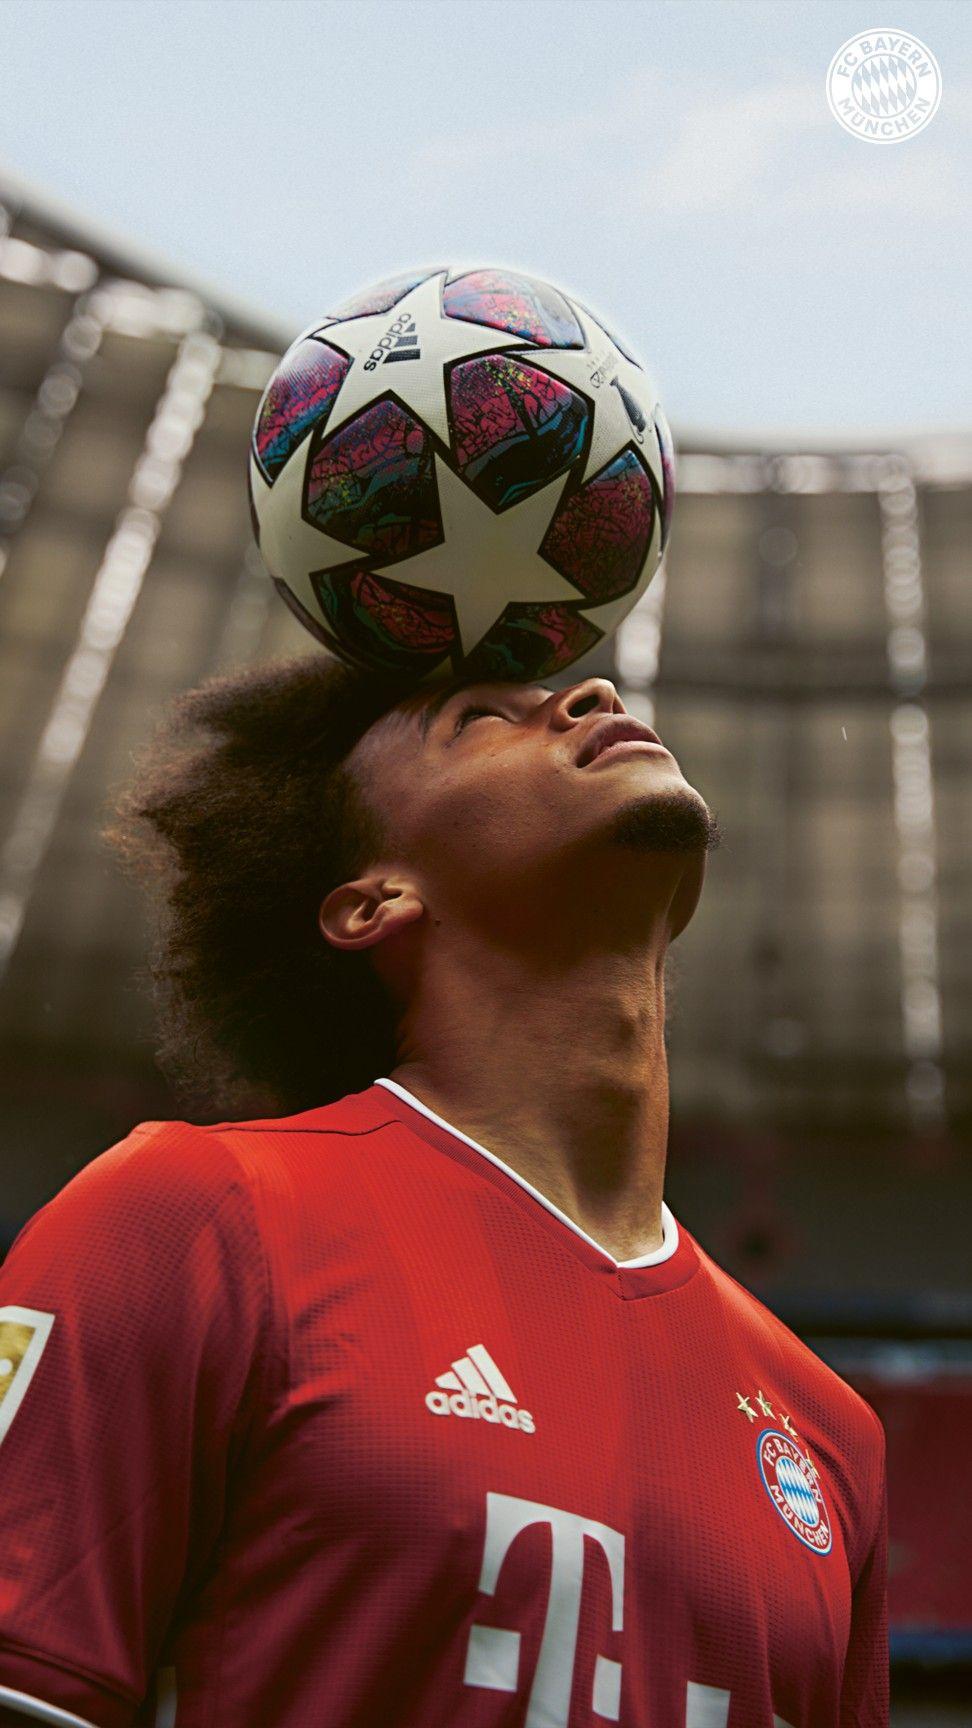 Pin Em Futebol 2